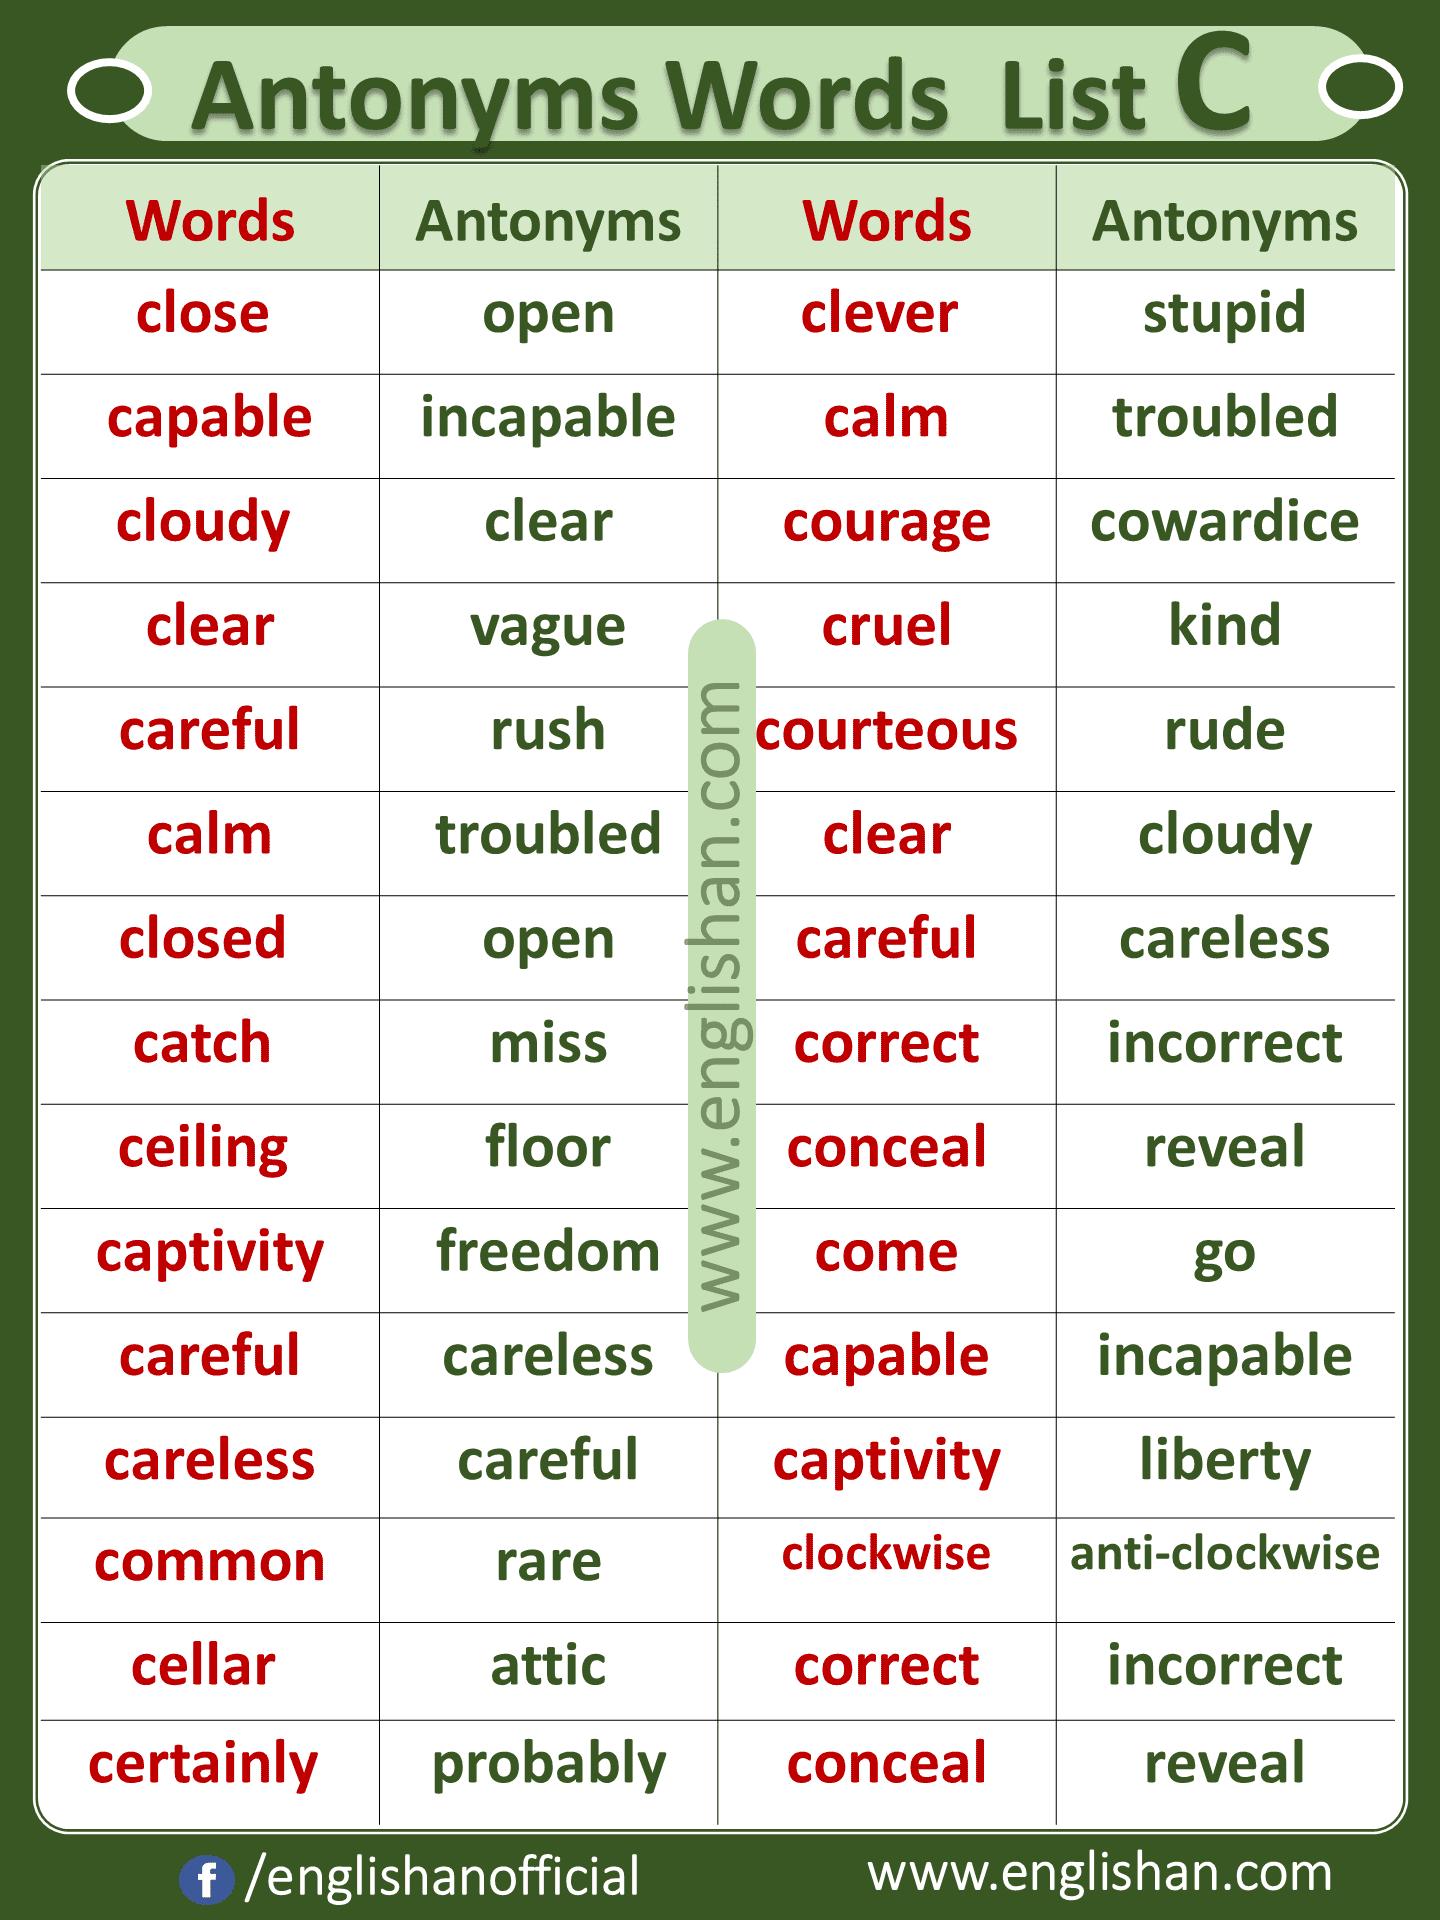 Antonym Words List C